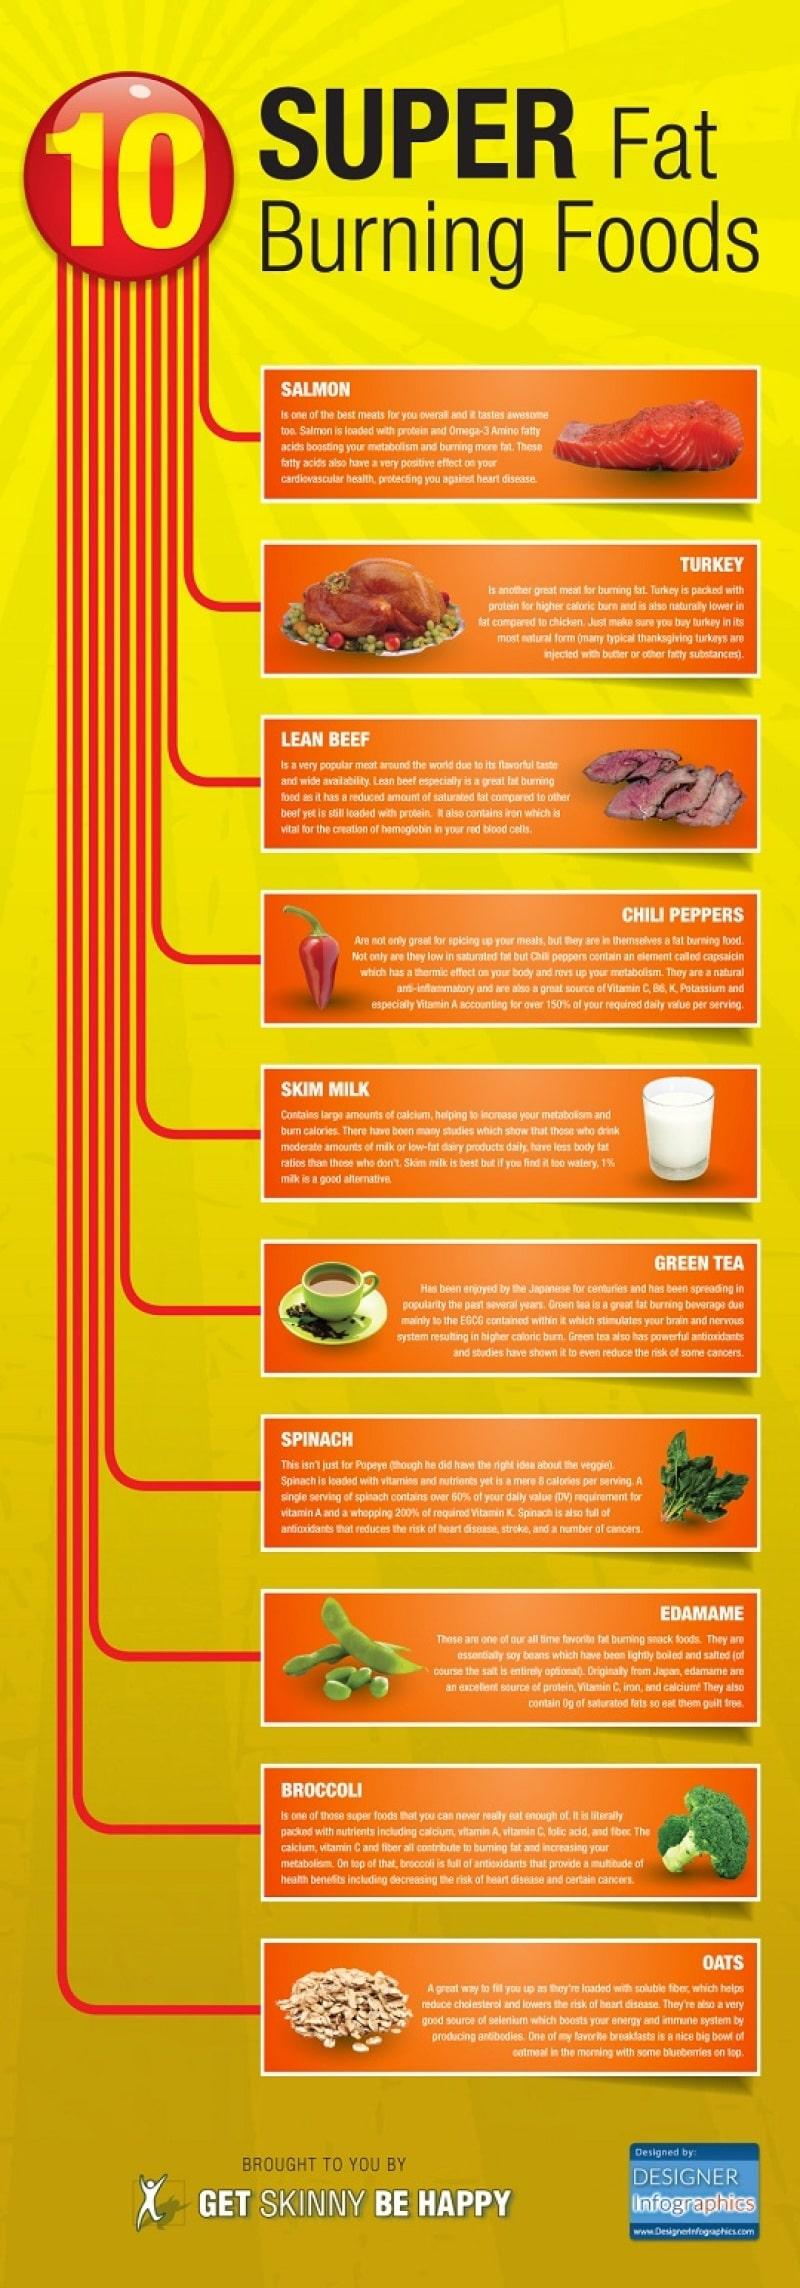 Super Fat Burning Foods